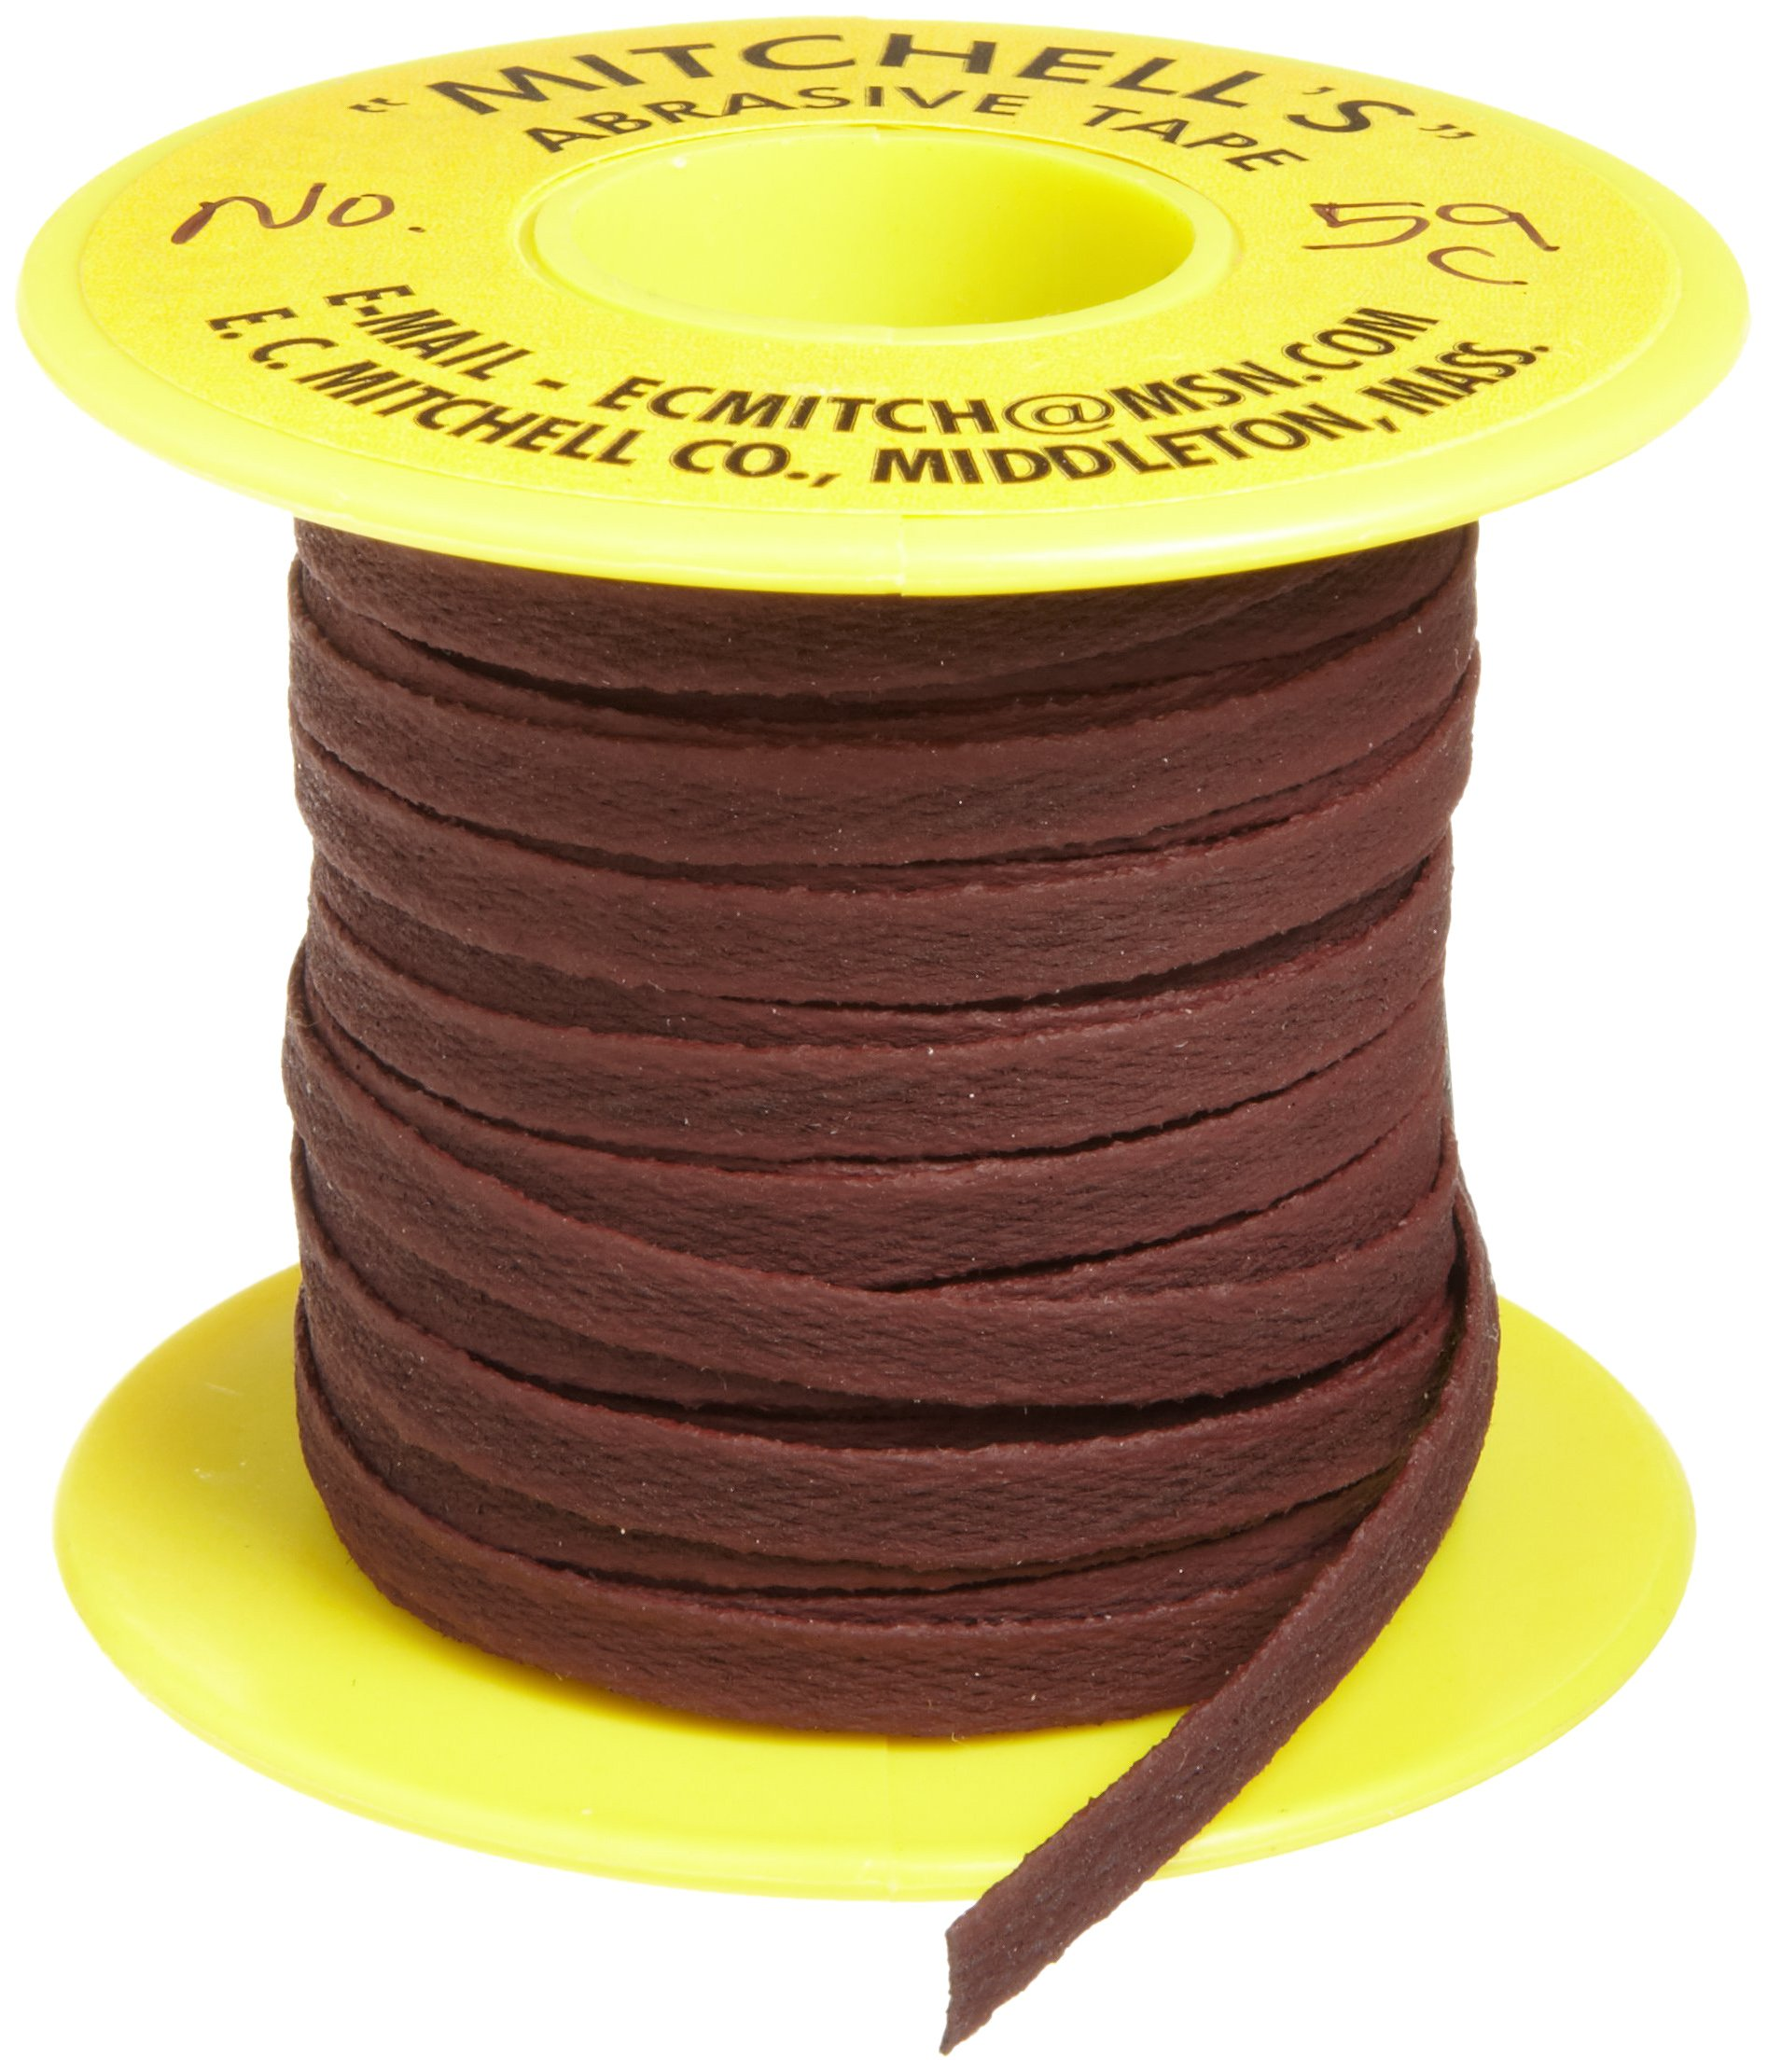 Mitchell Abrasives 59-C Flat Crocus Polishing Tape, 1/4'' Wide x 25 Feet